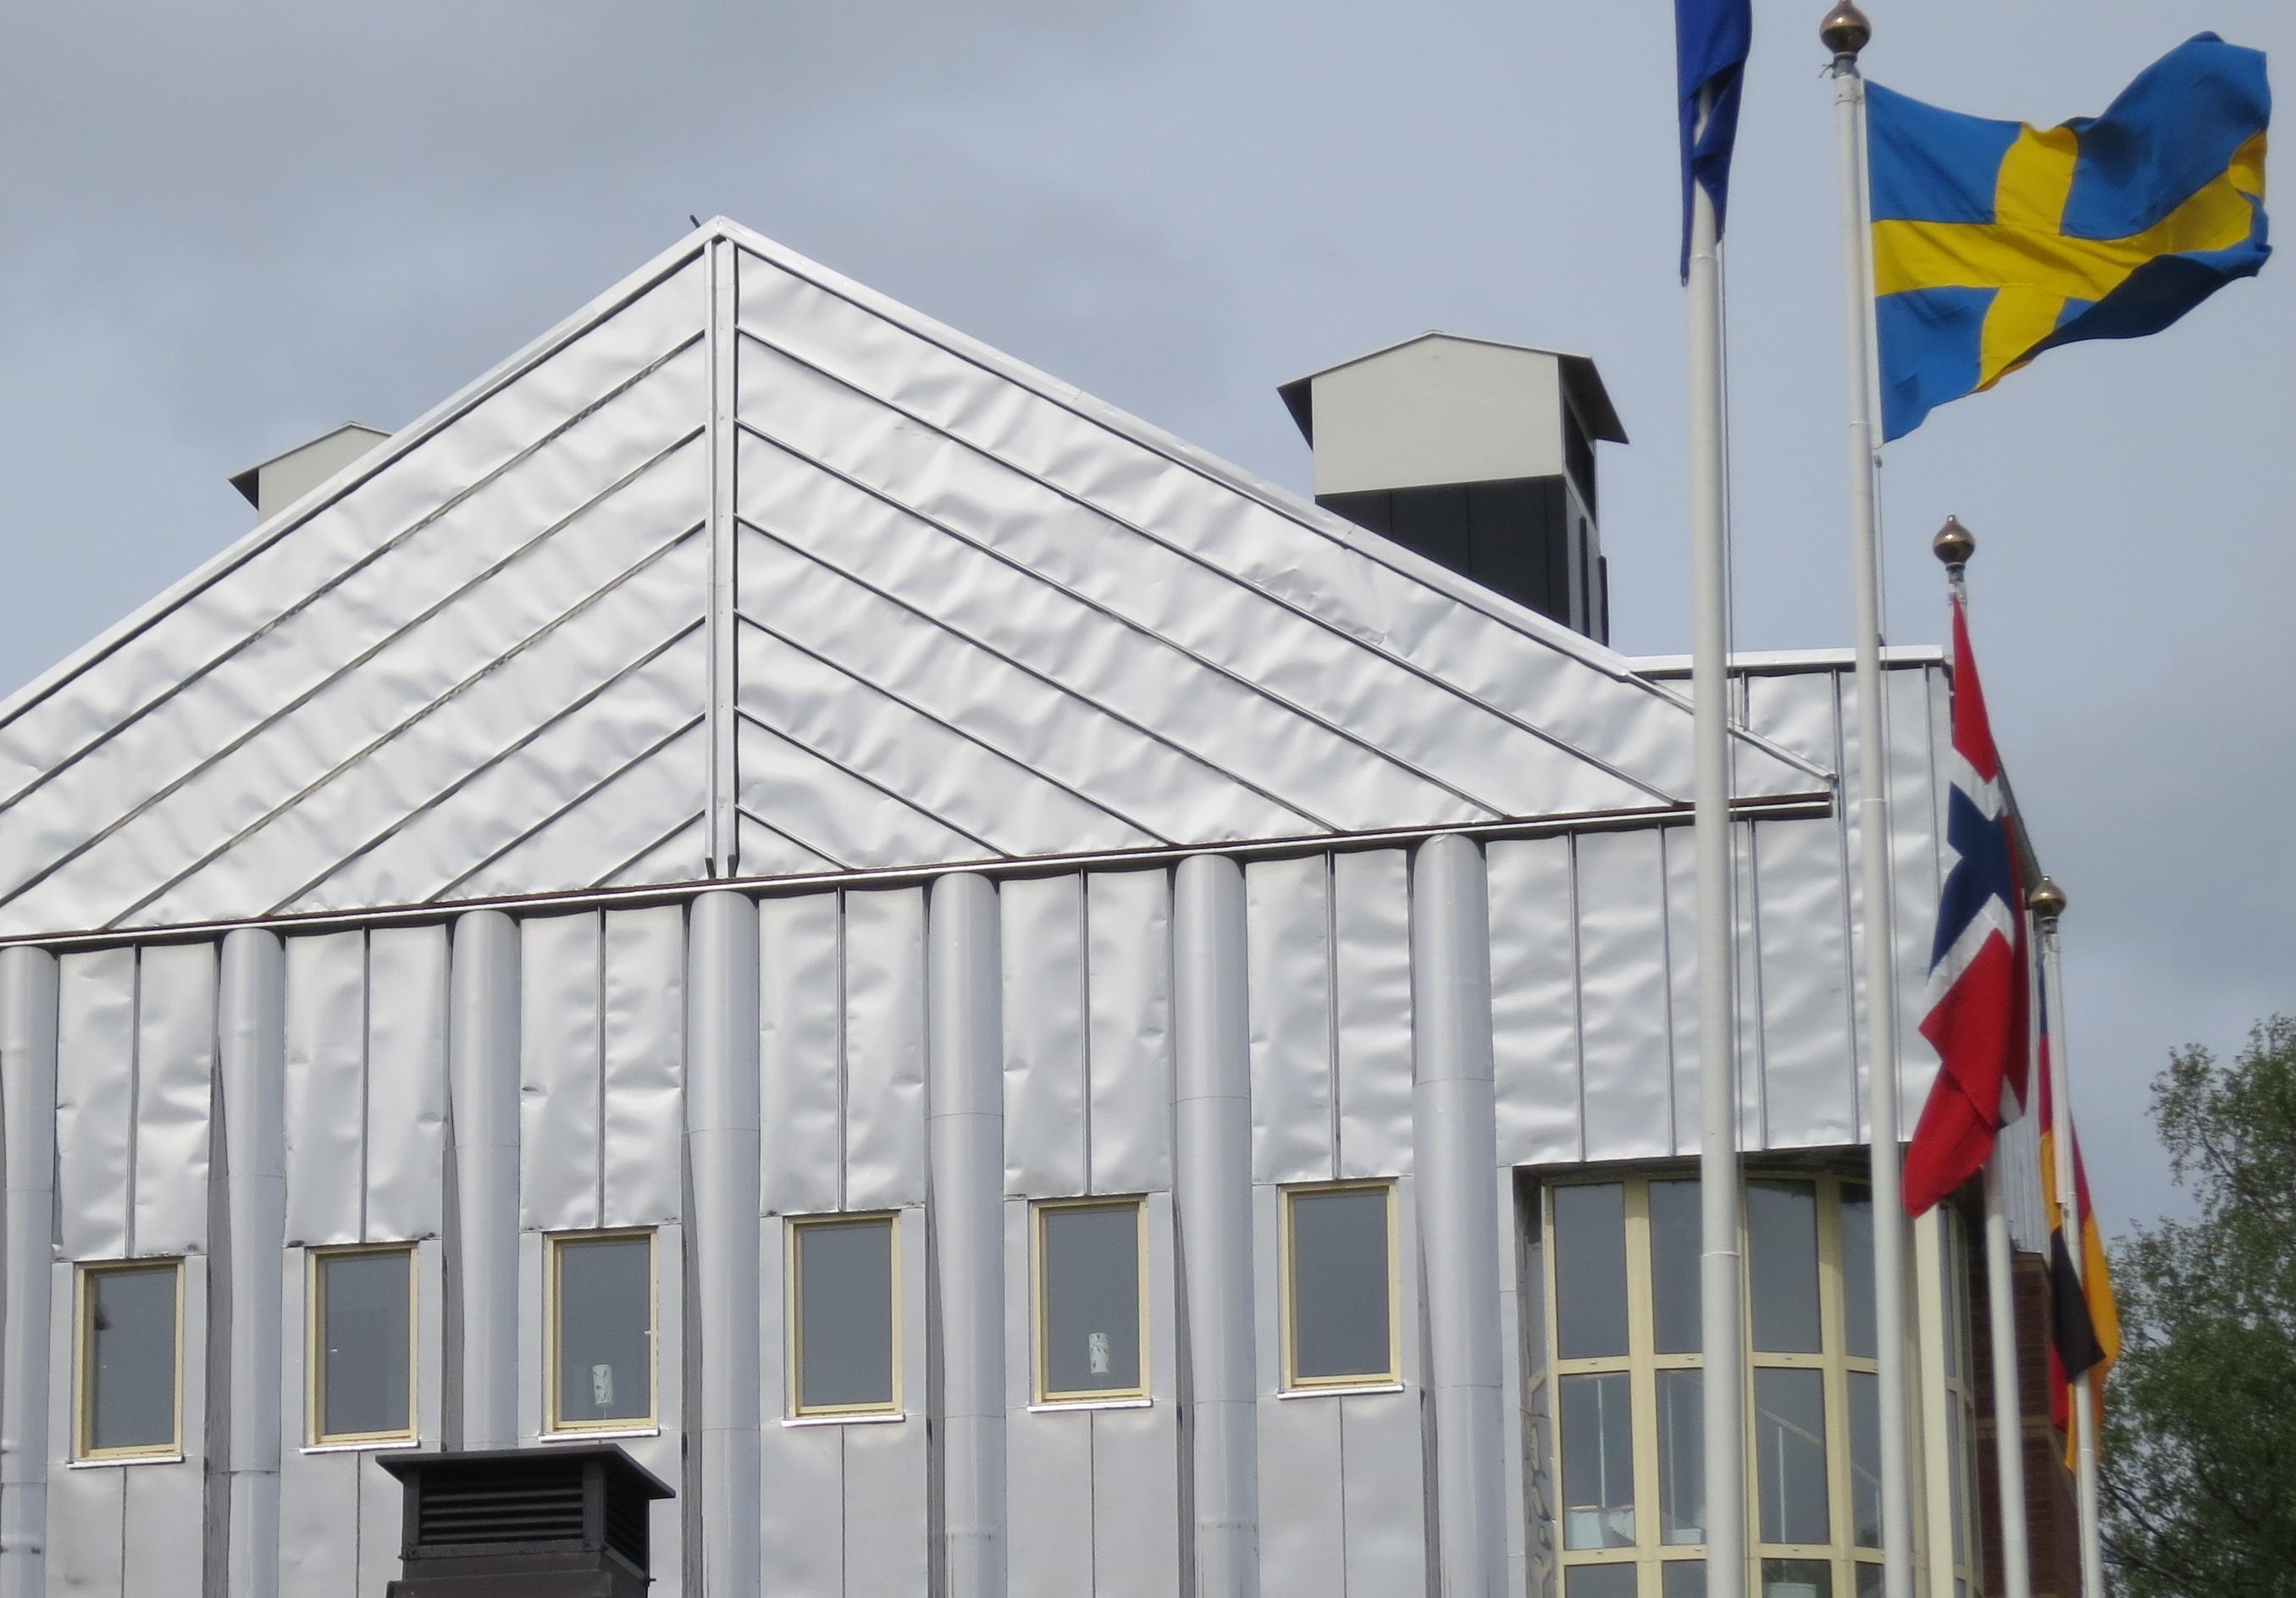 Bild 5:6. Den falsade plåten ger liv åt fasaden. Foto: Torbjörn Osterling.